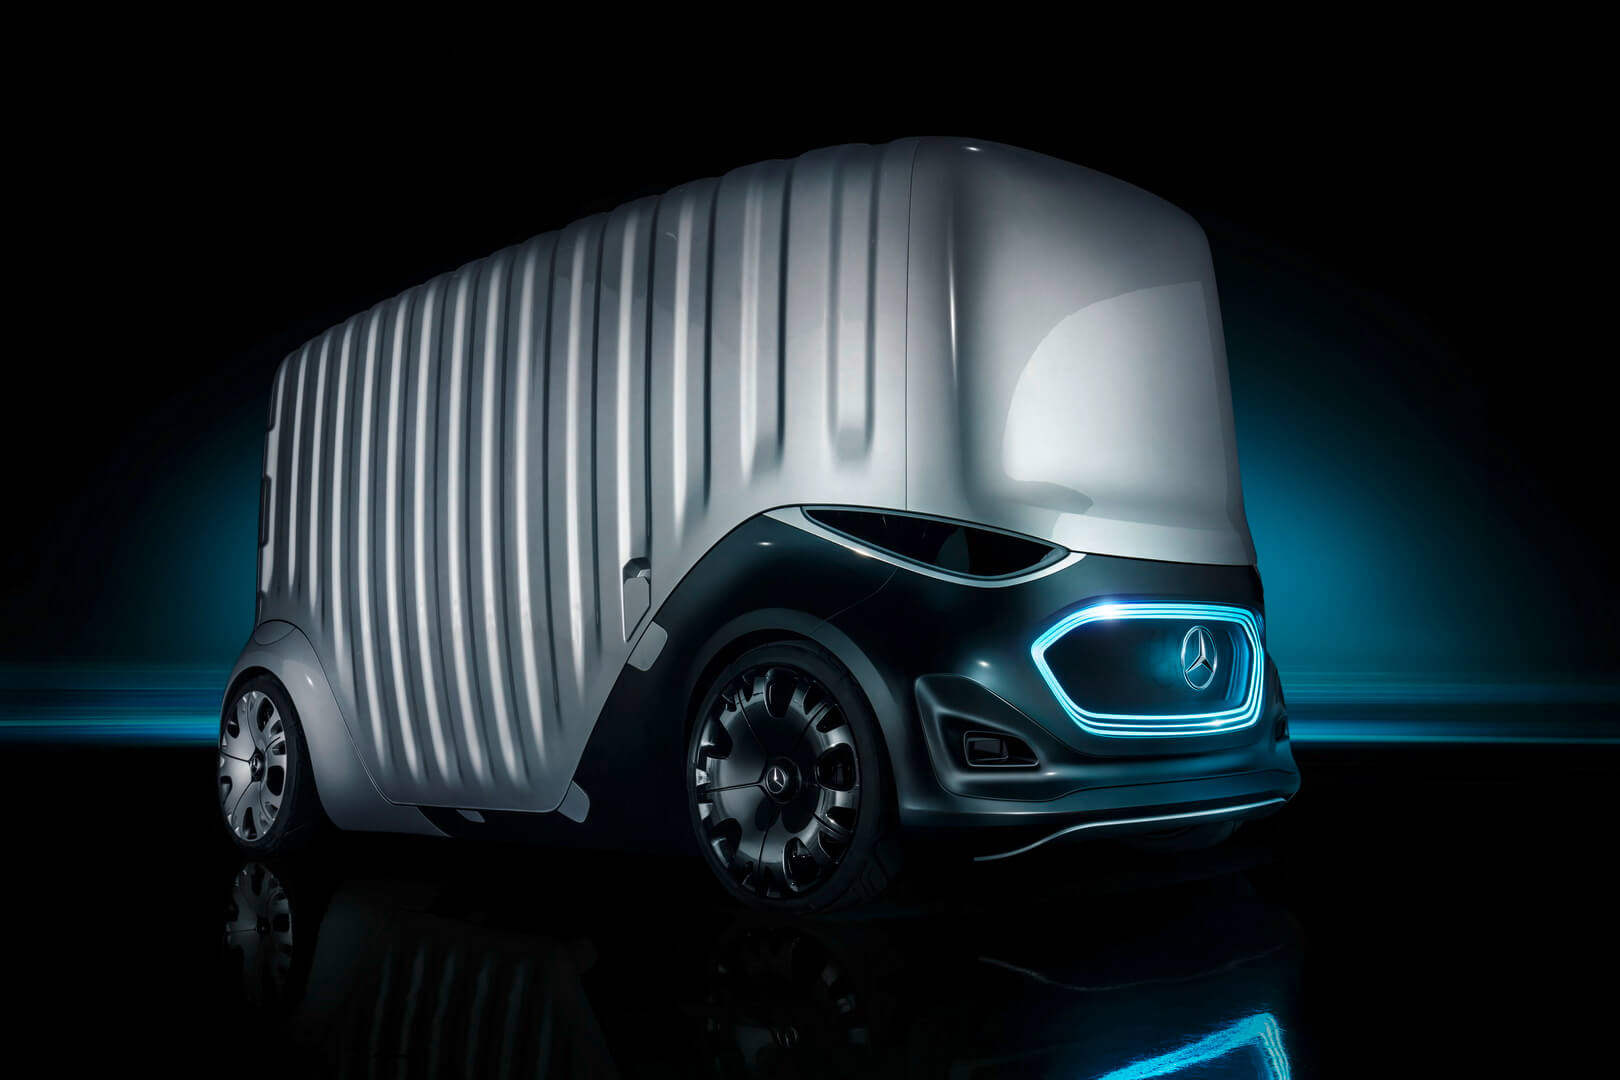 Грузовой вариант Mercedes-Benz Vision URBANETIC